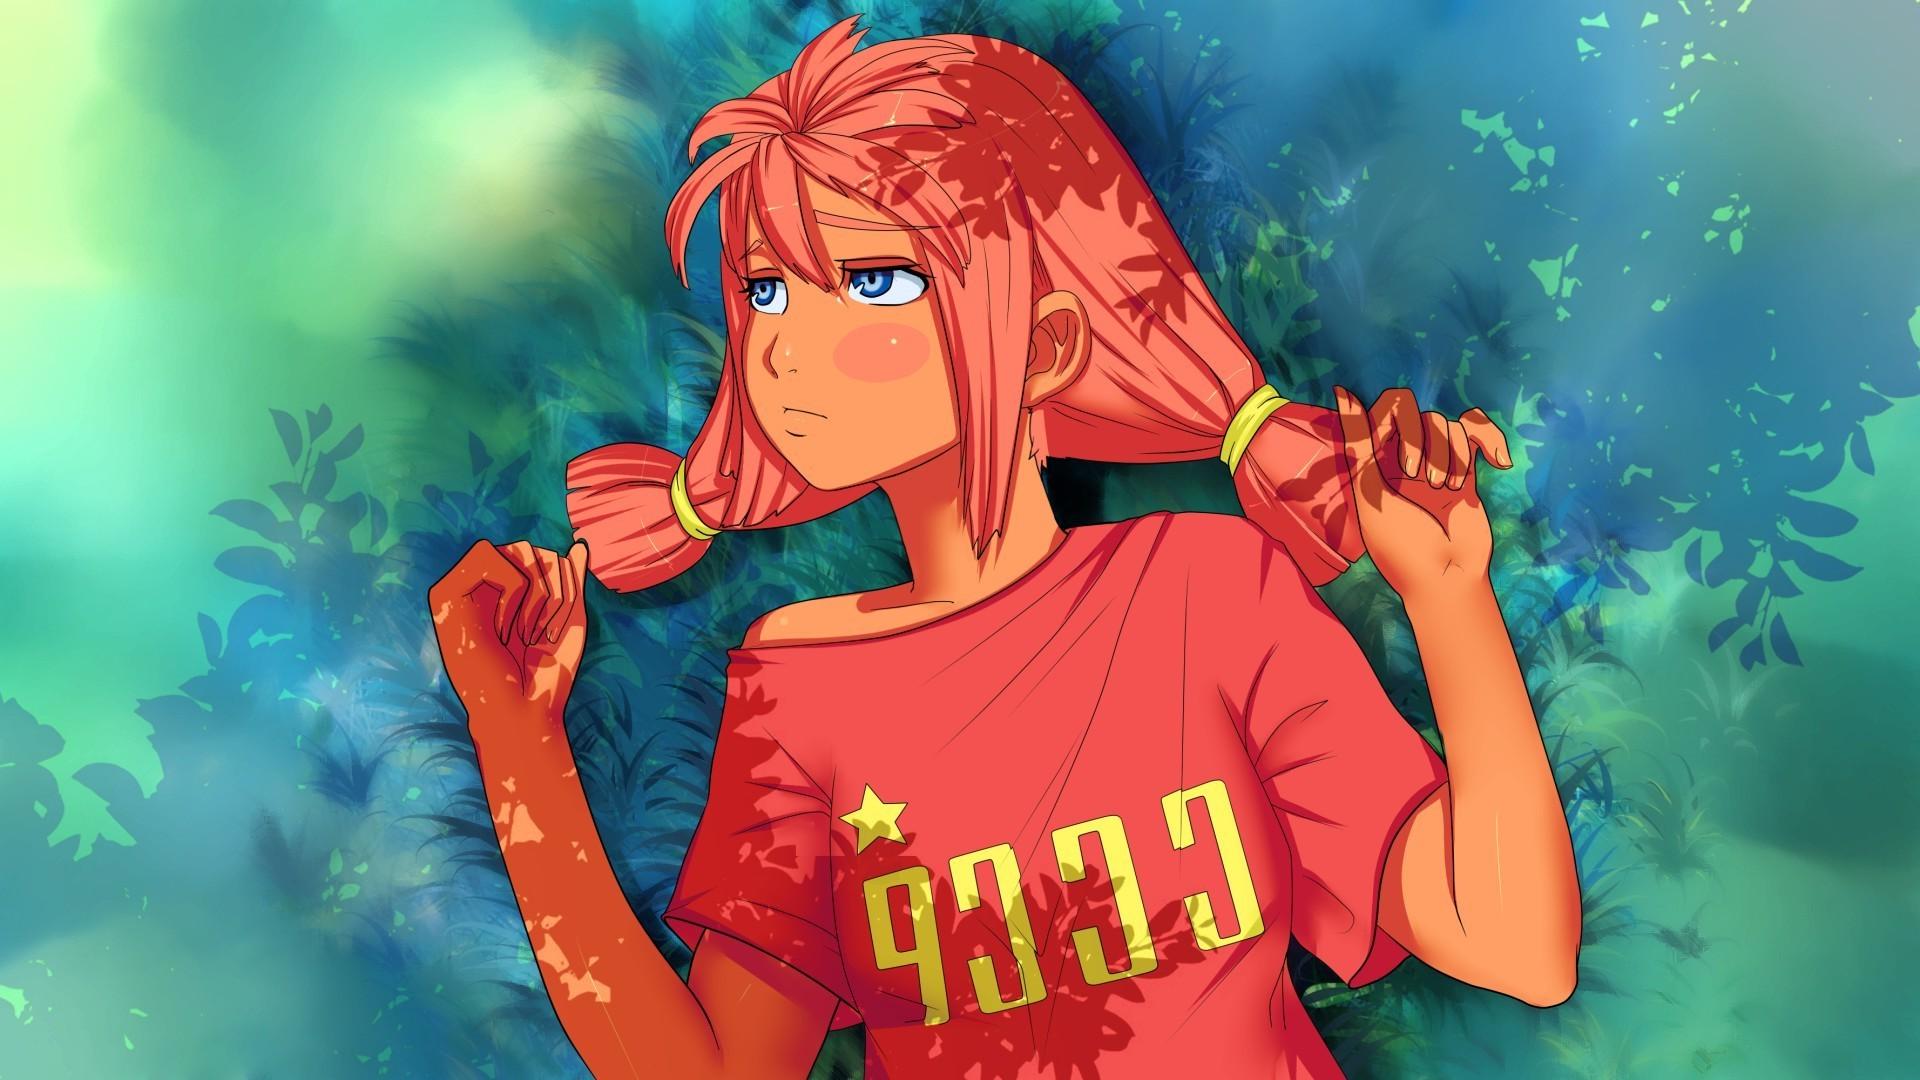 Ussr, Anime, Anime Girls, Leaves, Pigtails, Blushing, - Anime Girl Ussr - HD Wallpaper